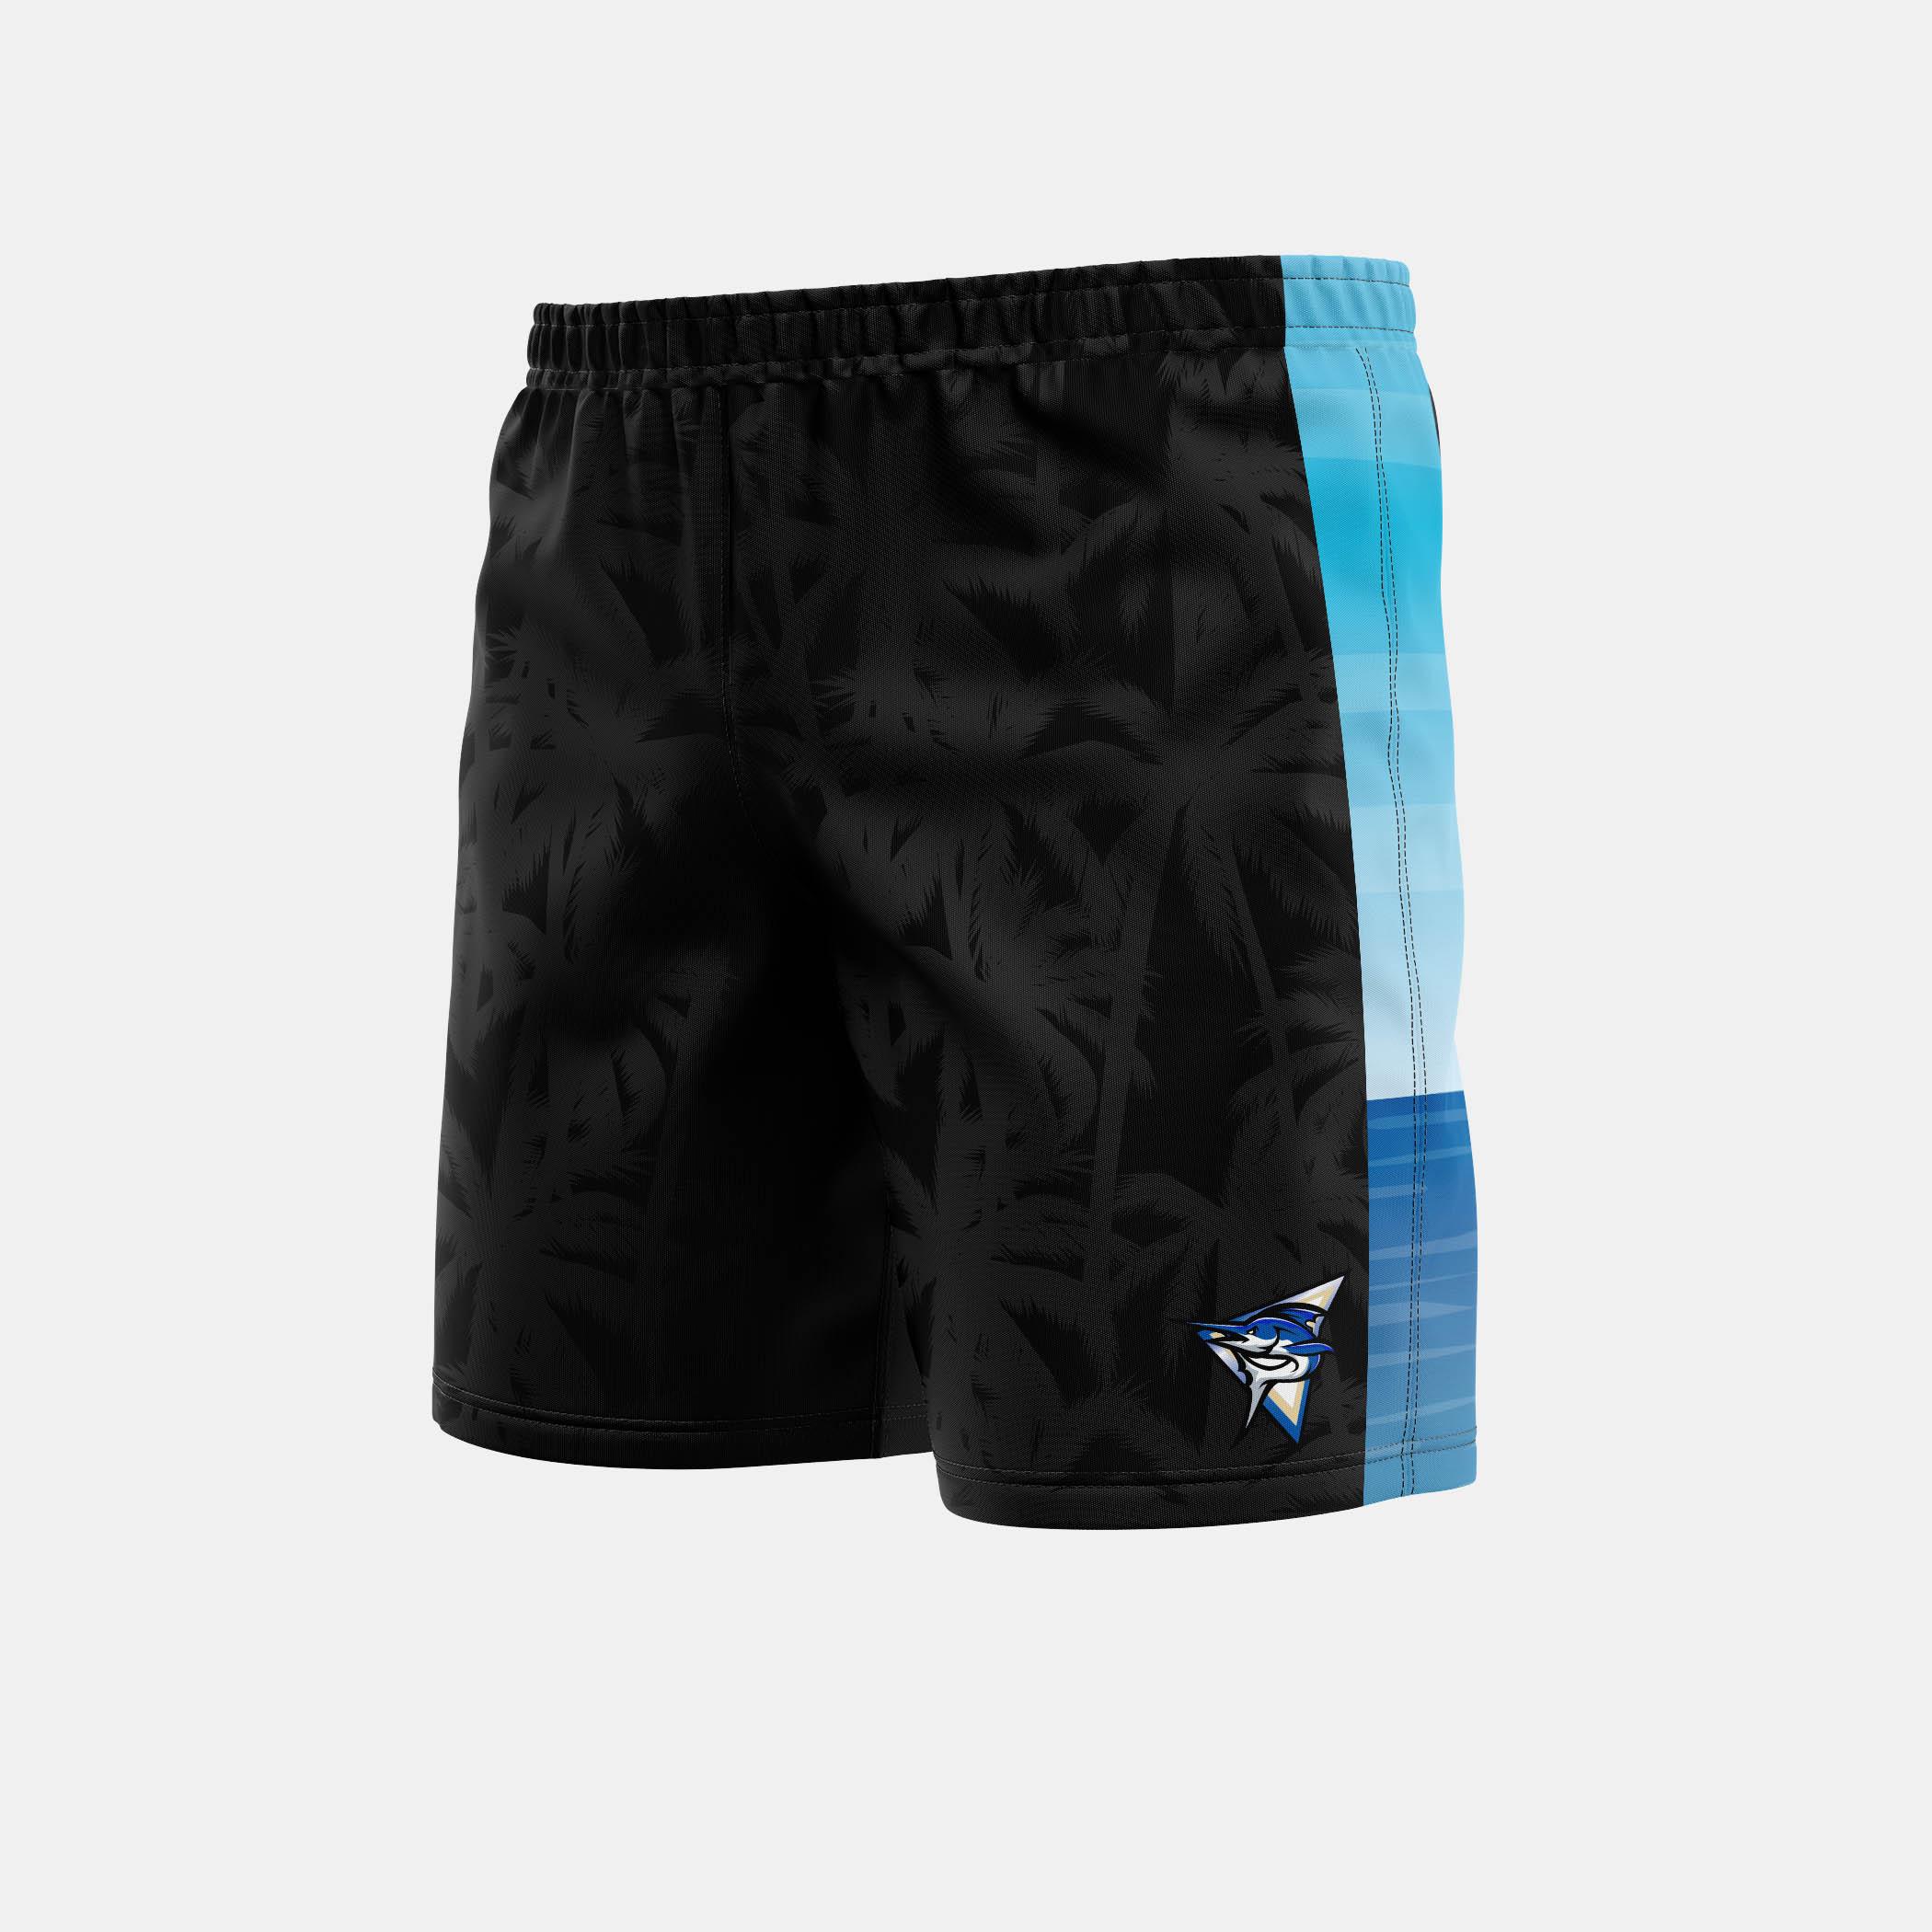 Seaside VB Shorts 3 4 L View edited